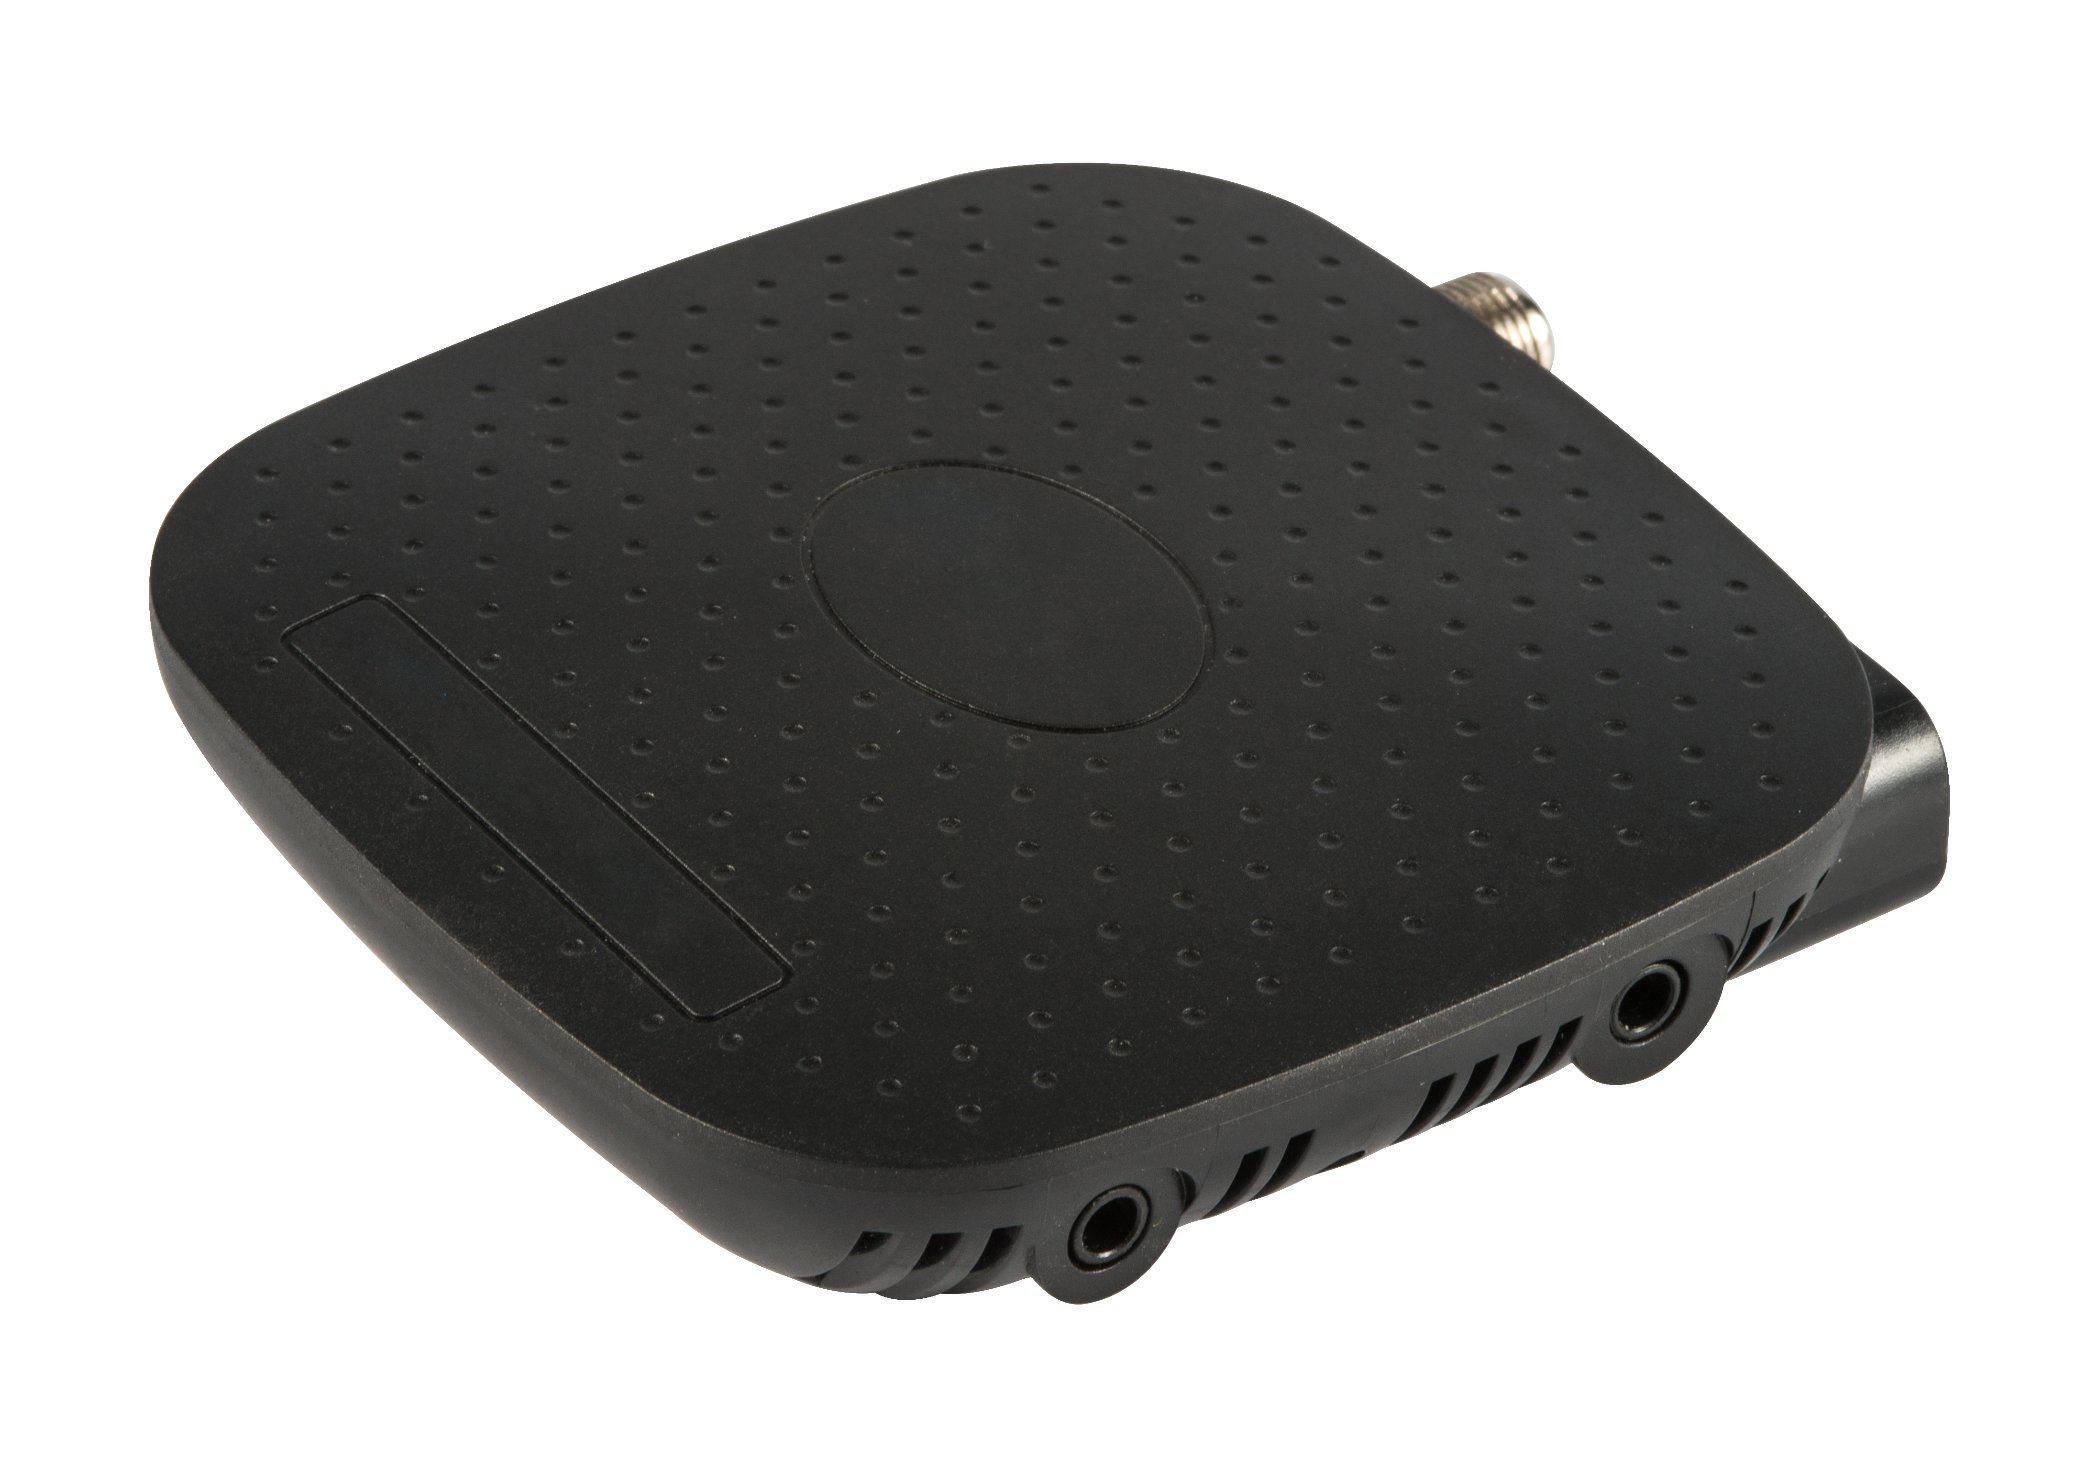 New 1080P Full HD Set Top Box DVB S2 with HD Channels